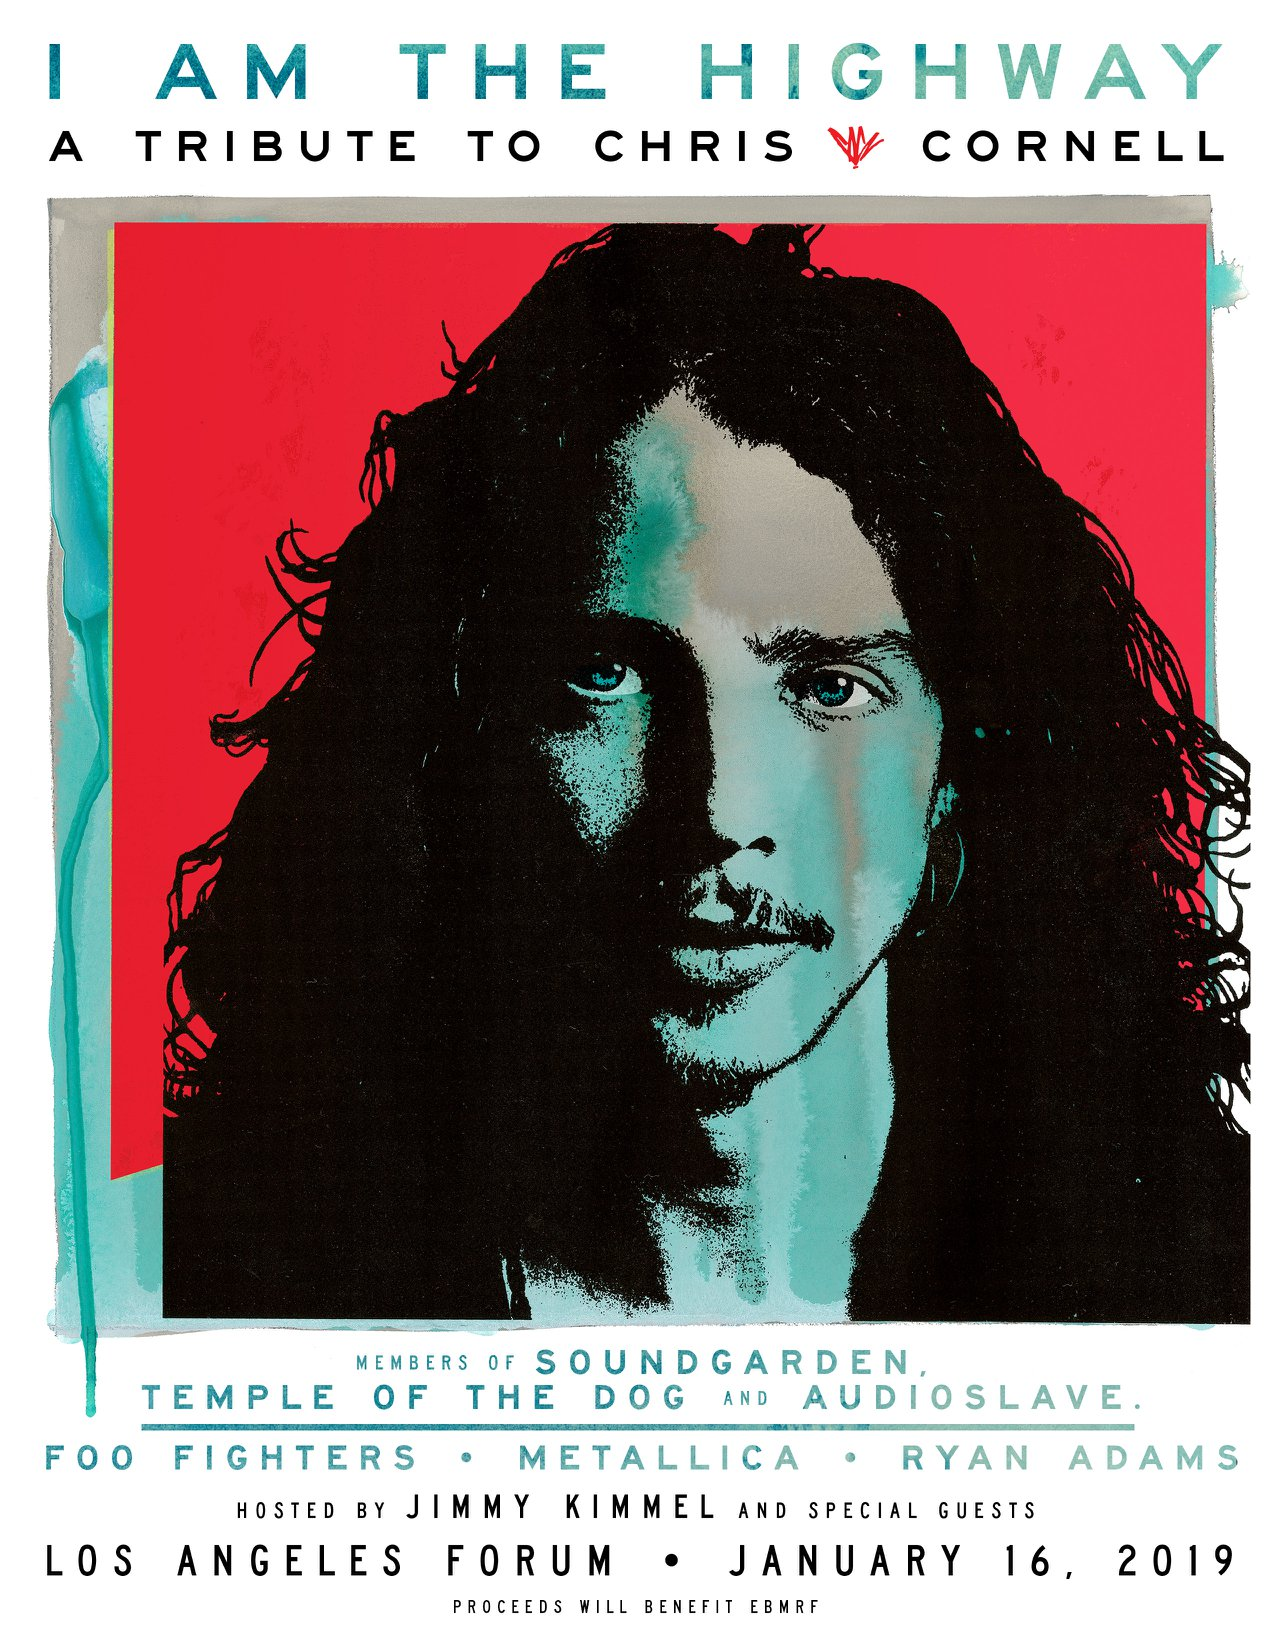 Músicos de Soundgarden, Metallica y Audioslave harán tributo a Chris Cornell